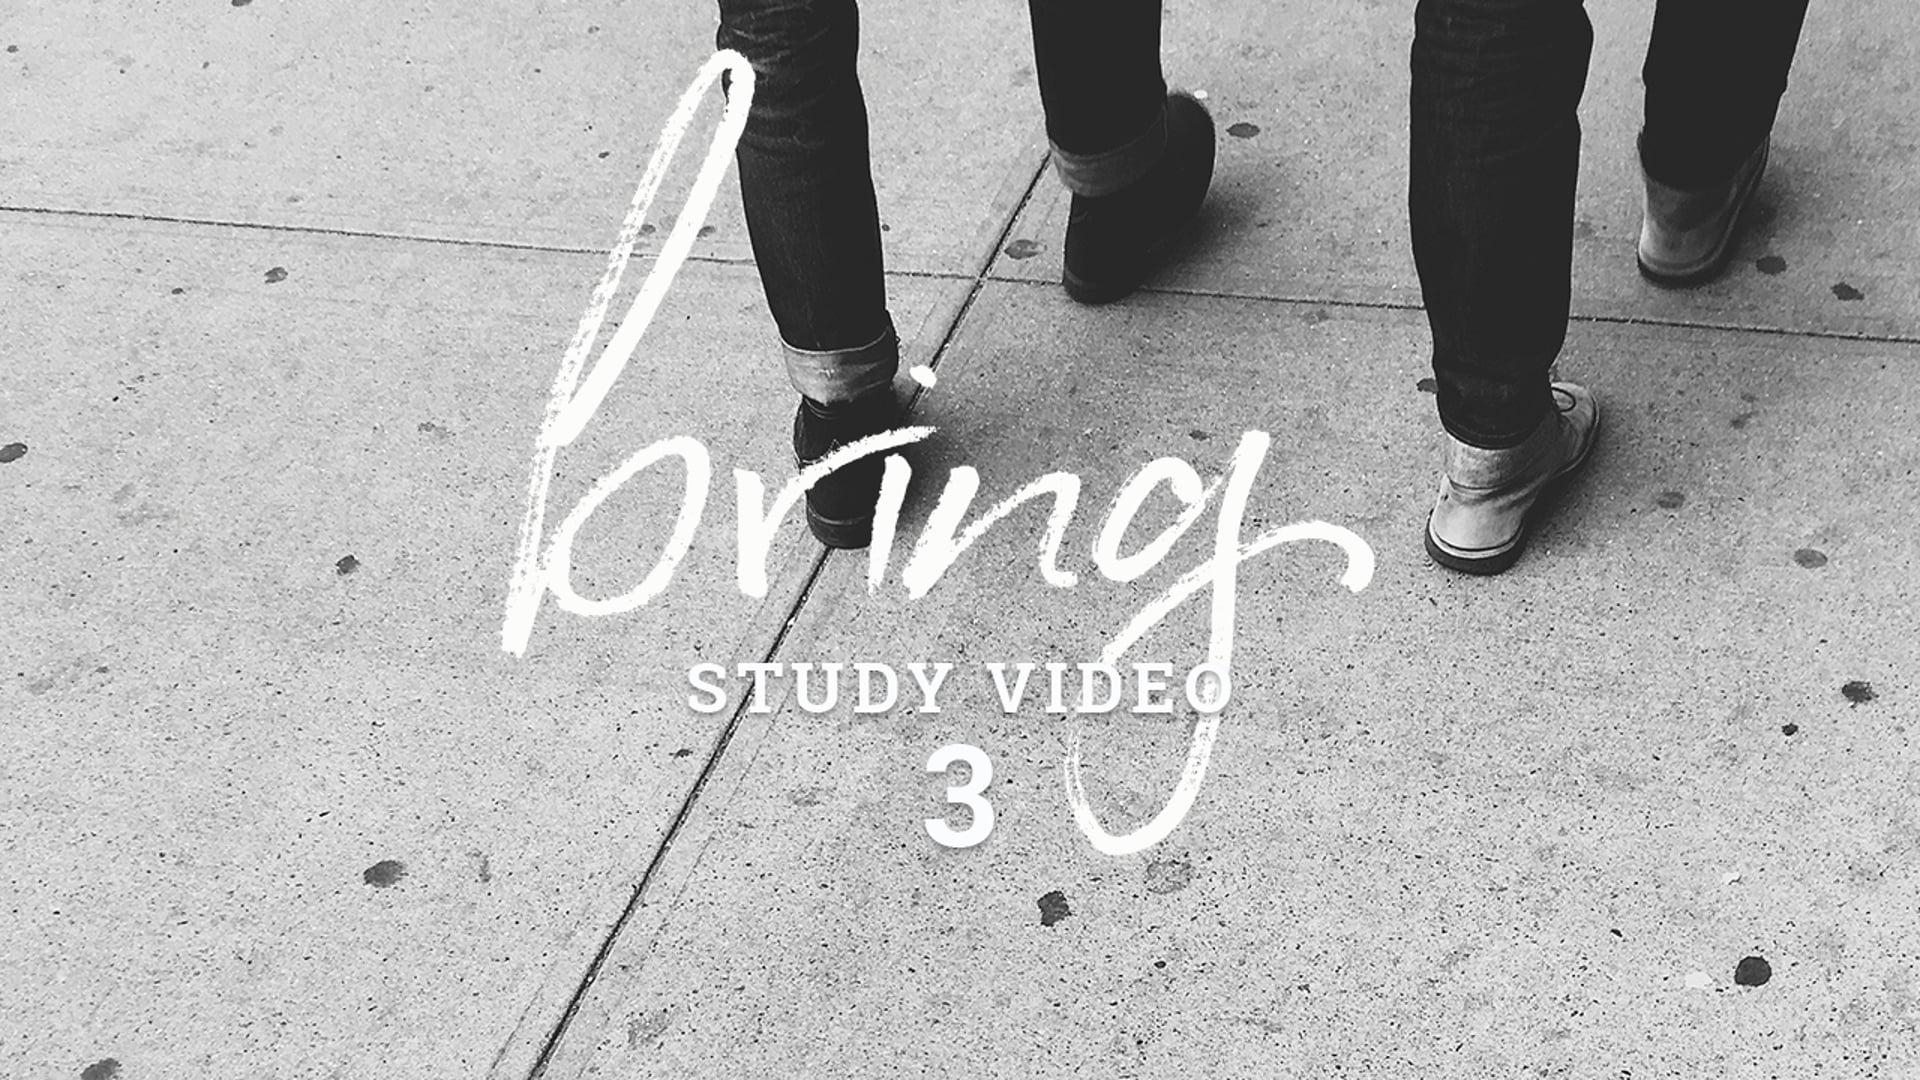 Bring - Study Video 3